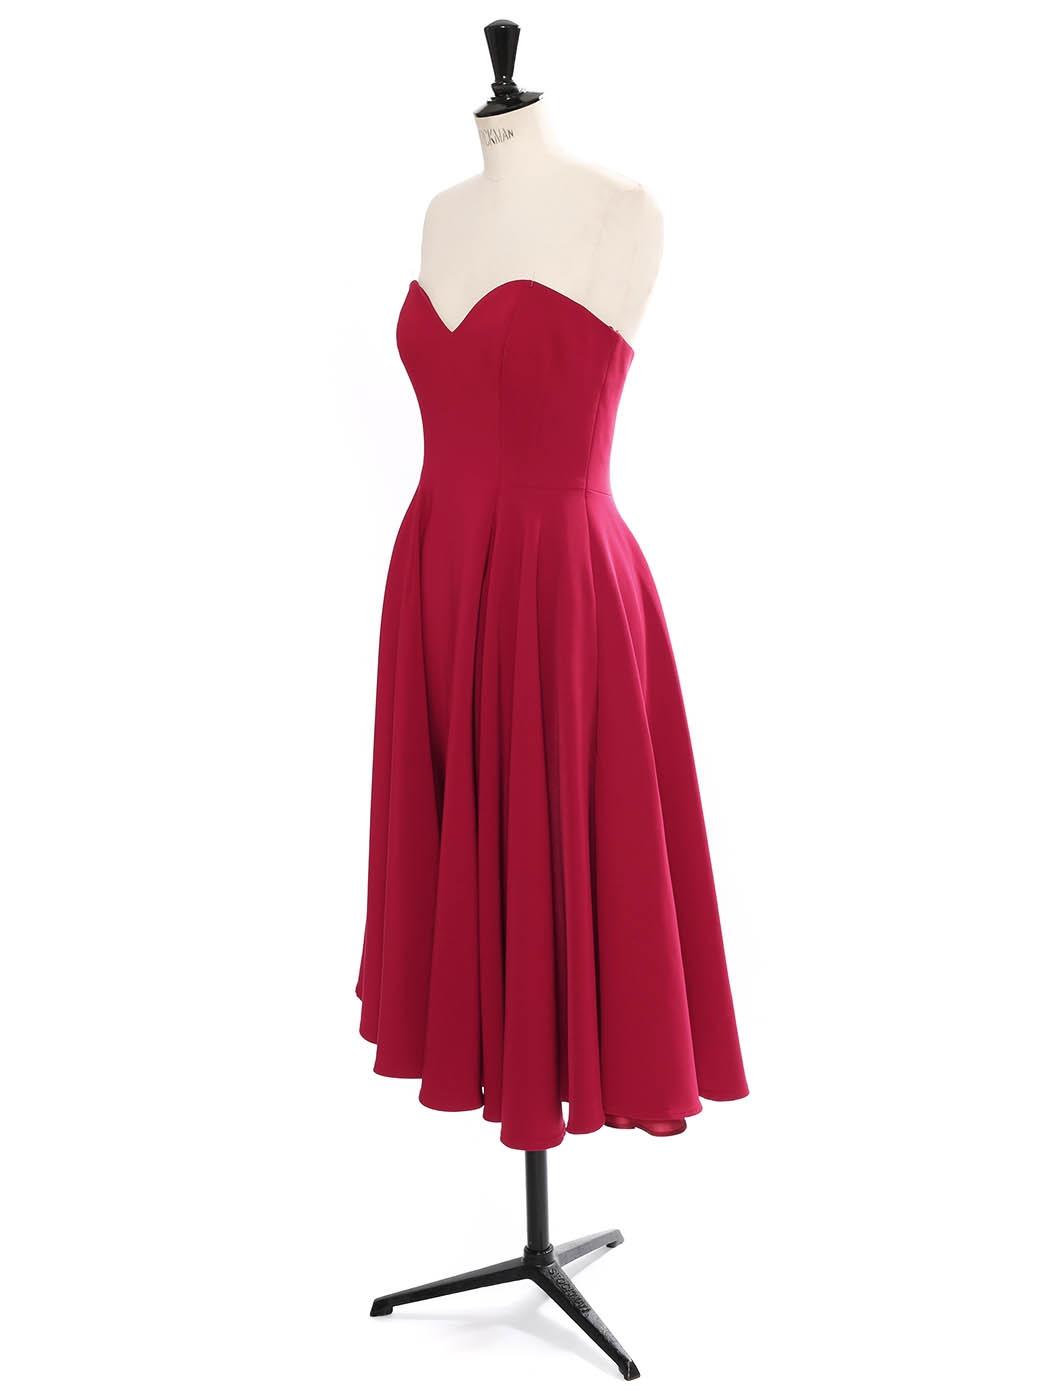 Louise Paris Sara Battaglia Robe Bustier Coeur Cintree Evasee En Crepe Rouge Framboise Fonce Taille 38